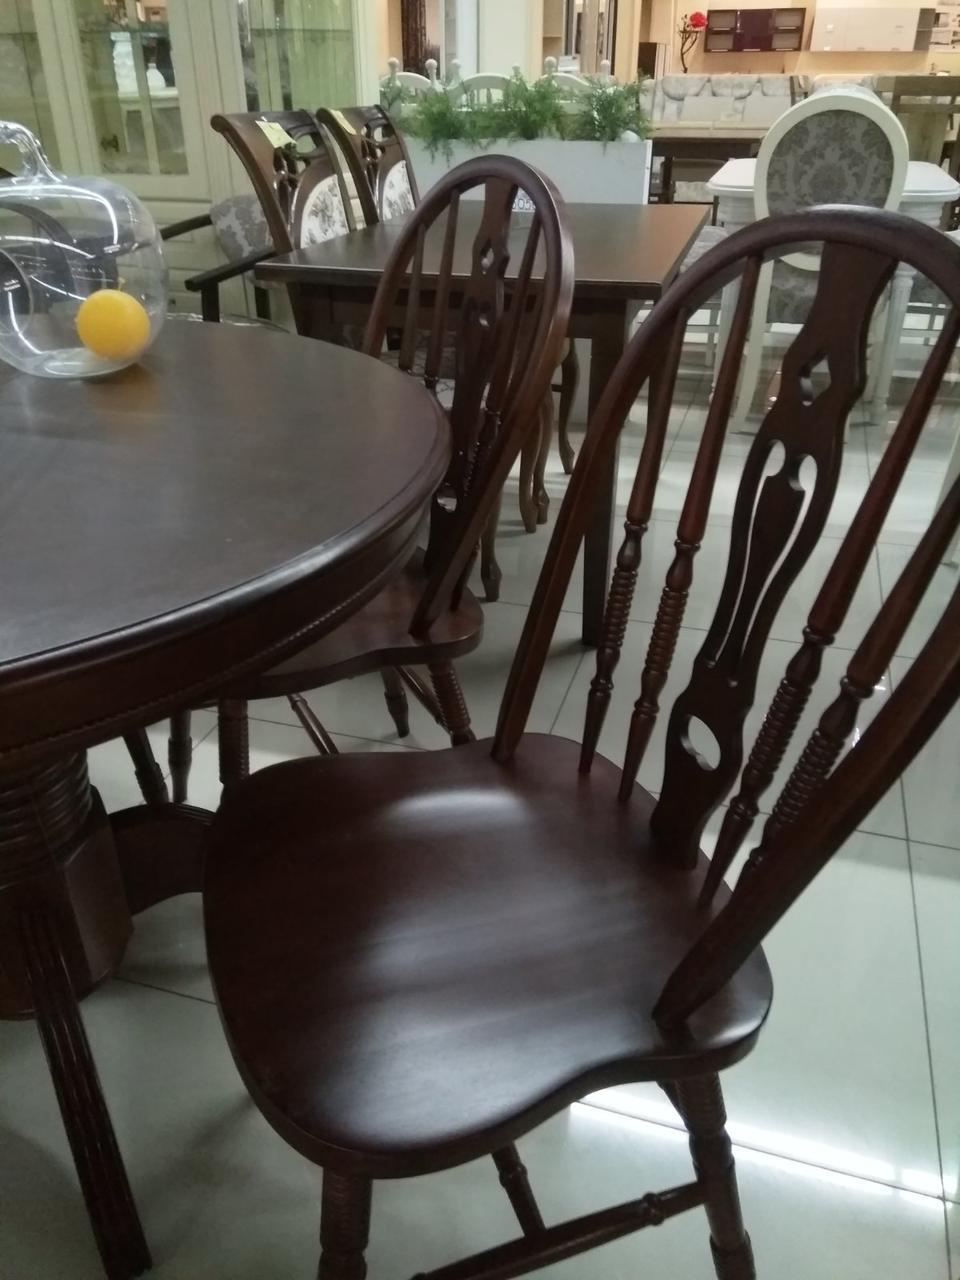 Обеденный стул C221-S цвет вишня Green River Wood, гевея